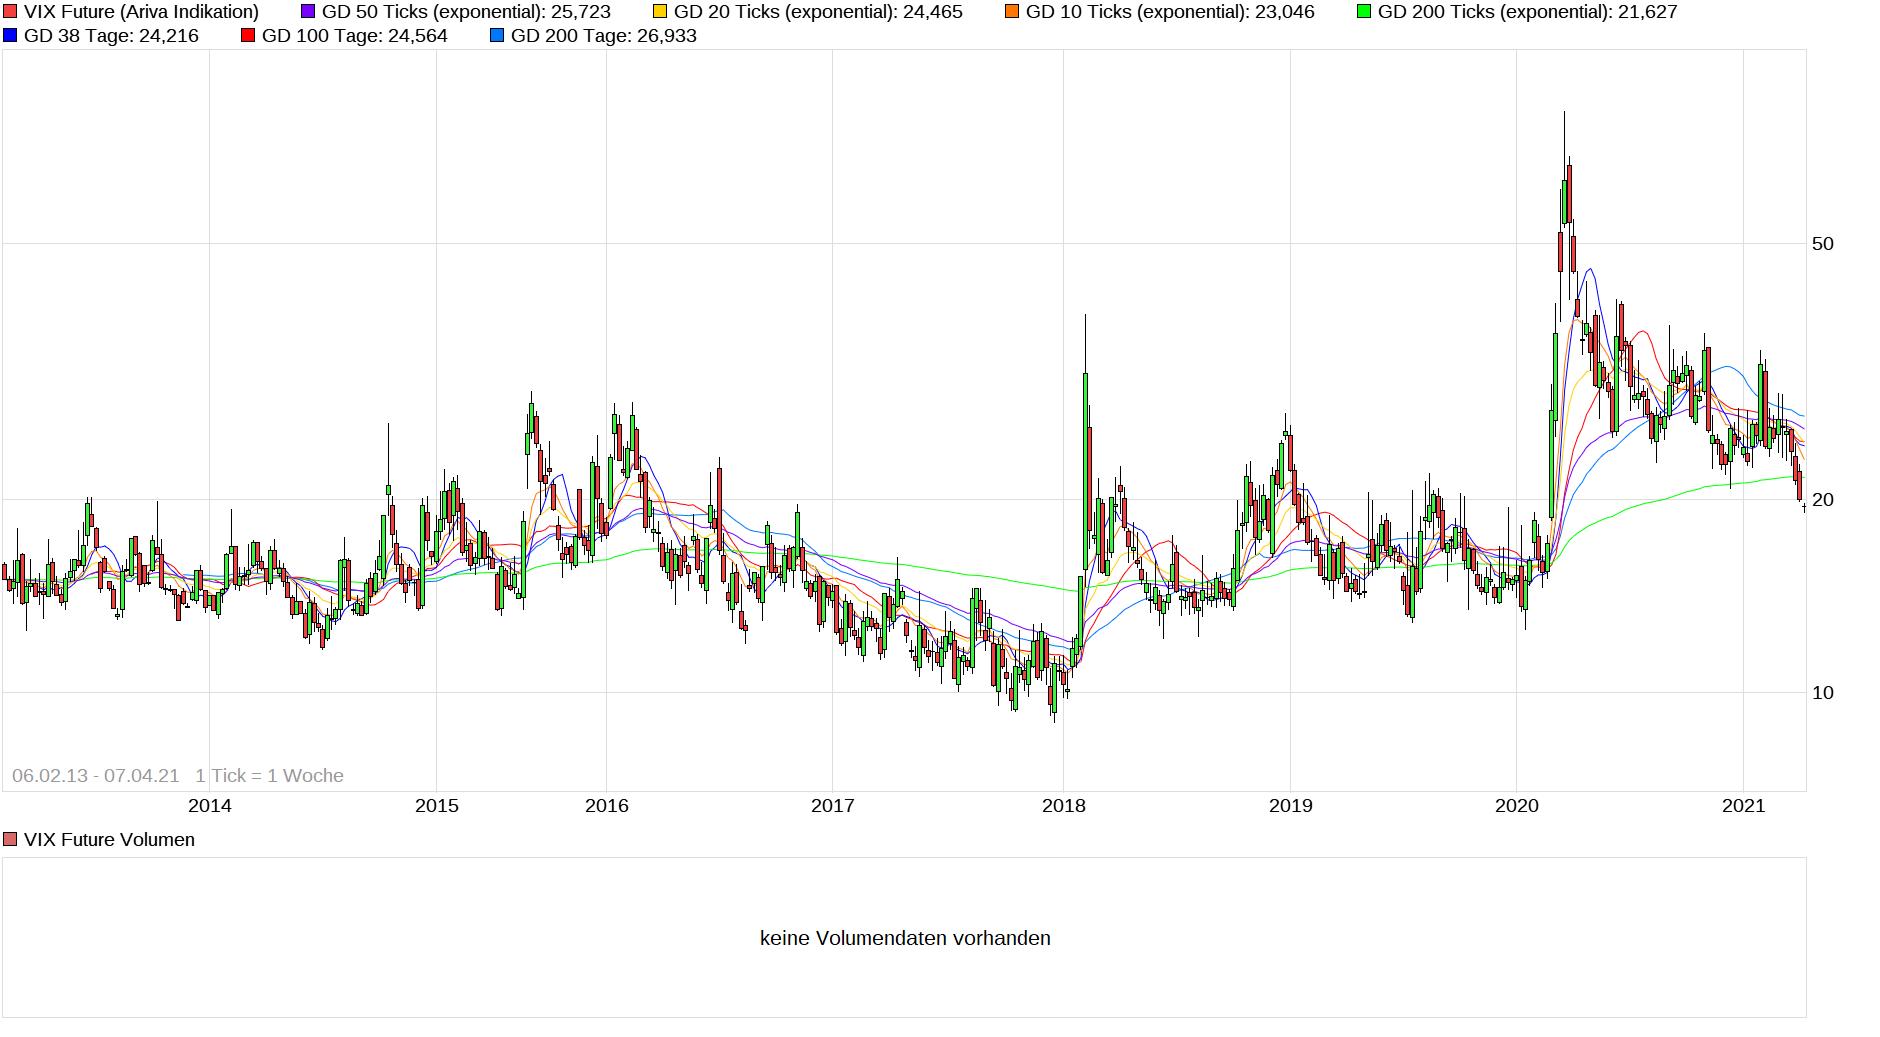 chart_all_vixfuture.png